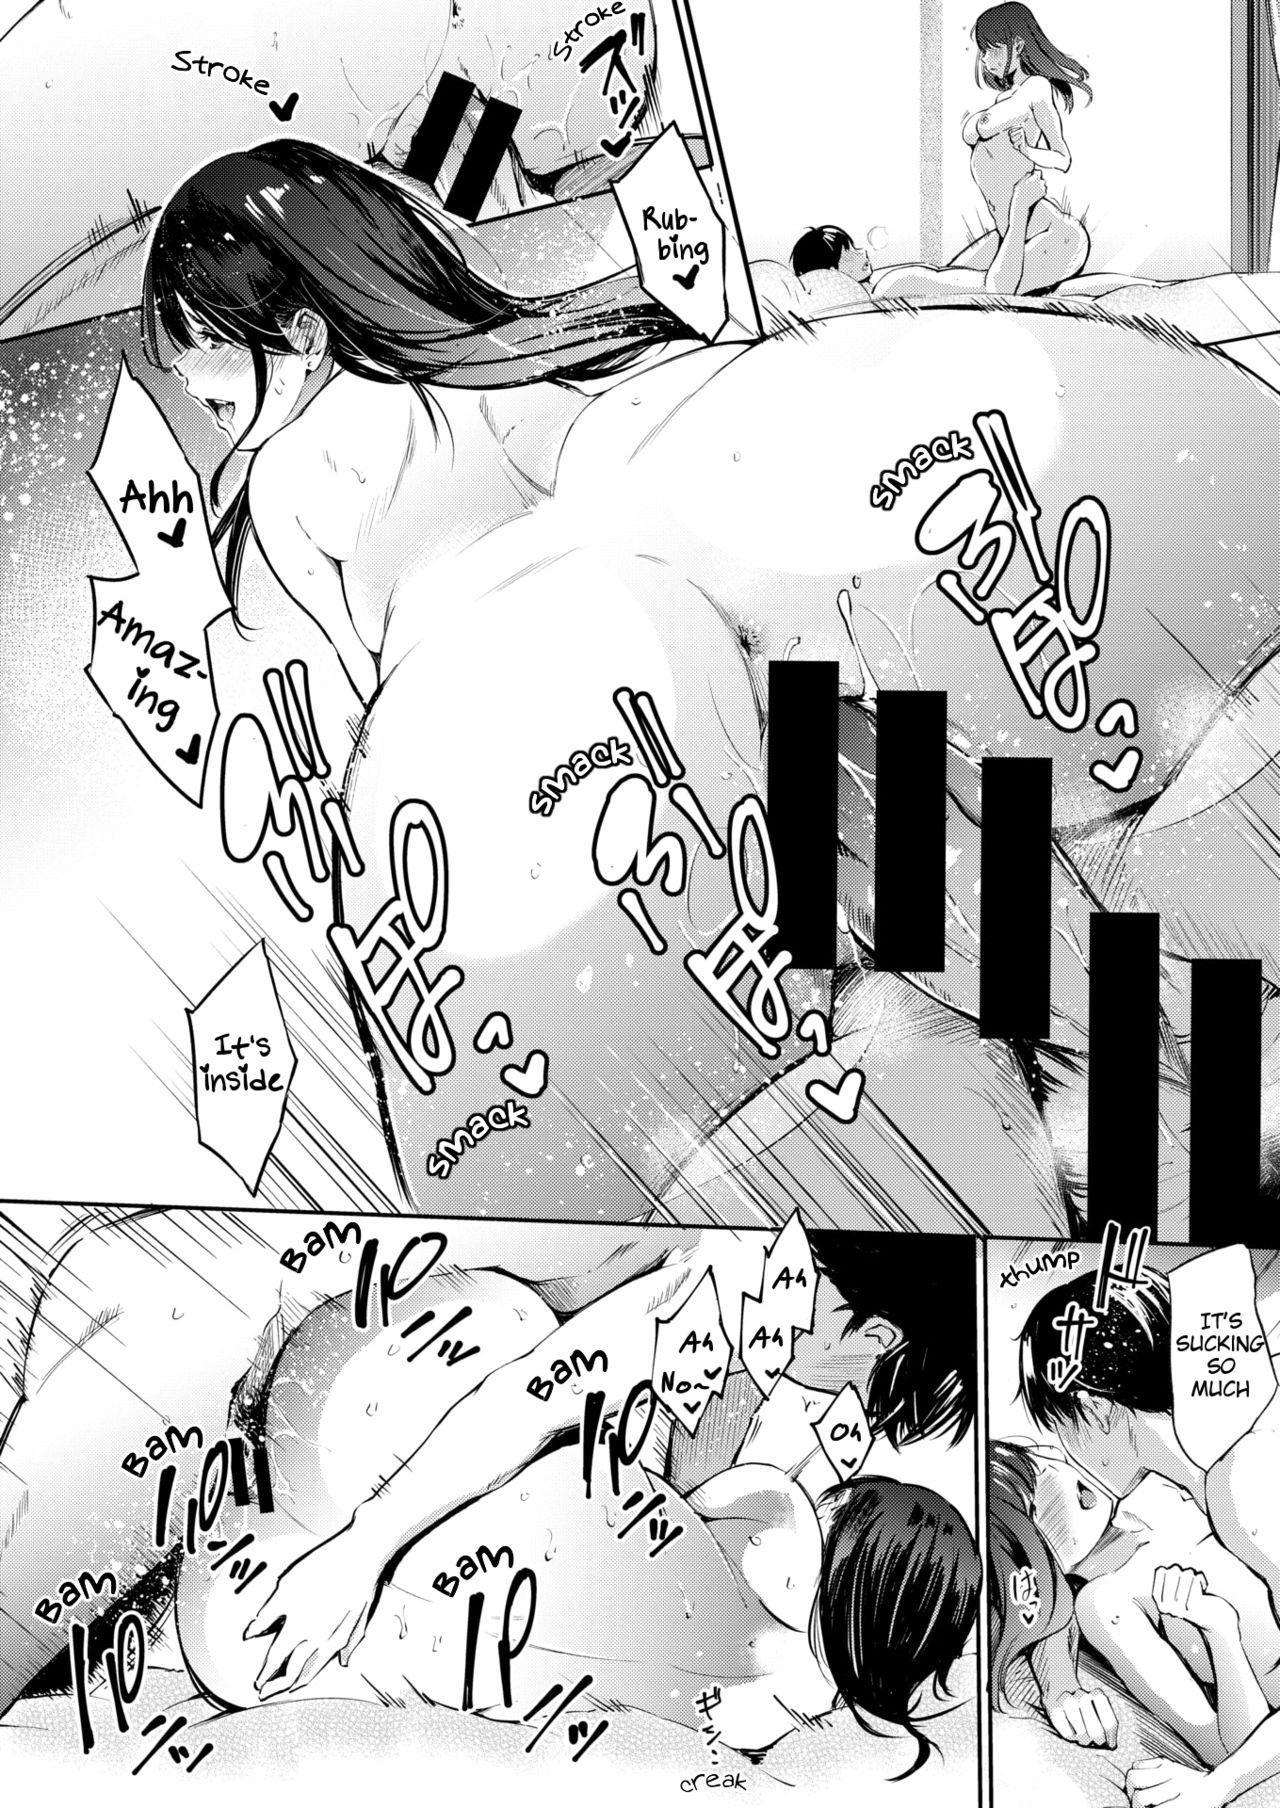 [Sanjuurou] delivery (sex) friend (COMIC X-EROS #73) [English] [Bobacat] [Digital] 14